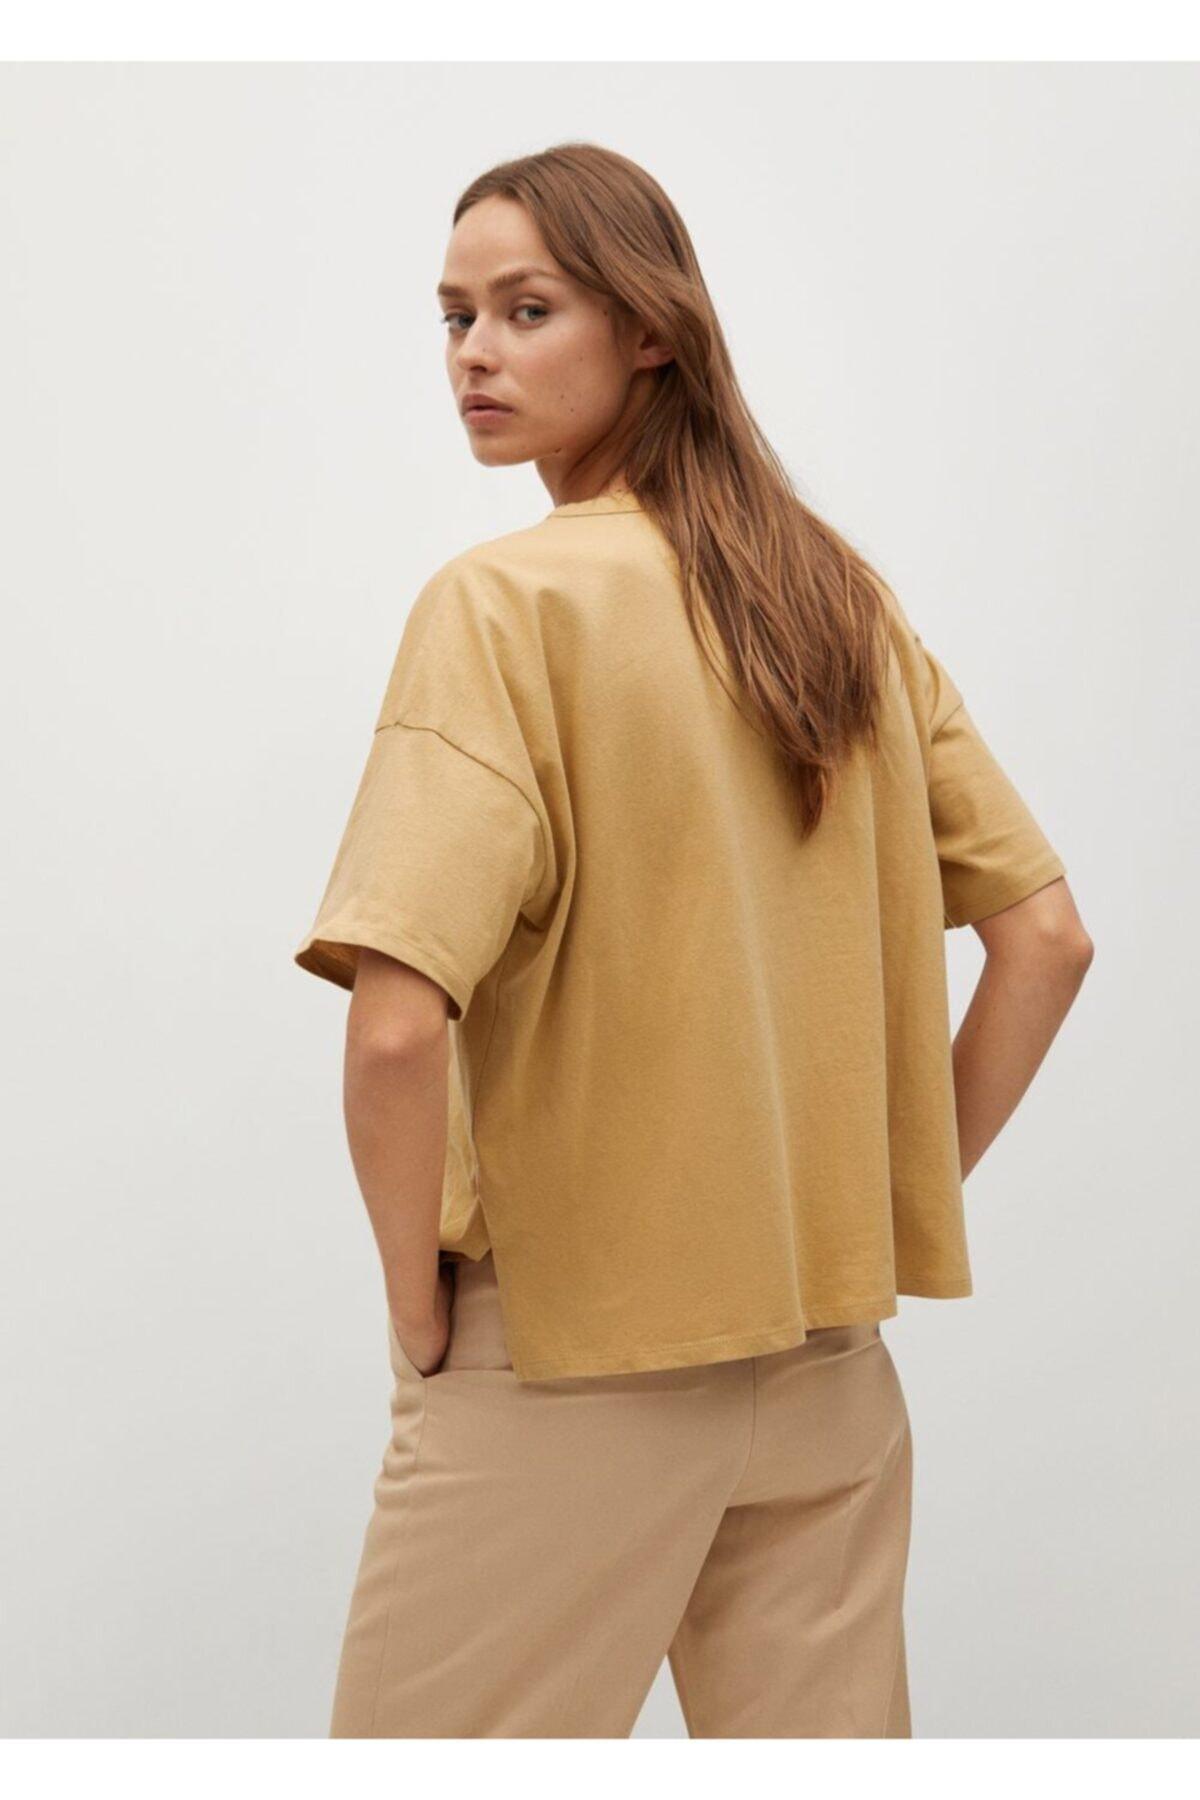 Mango Kadın Kahverengi Organik Pamuklu Tişört